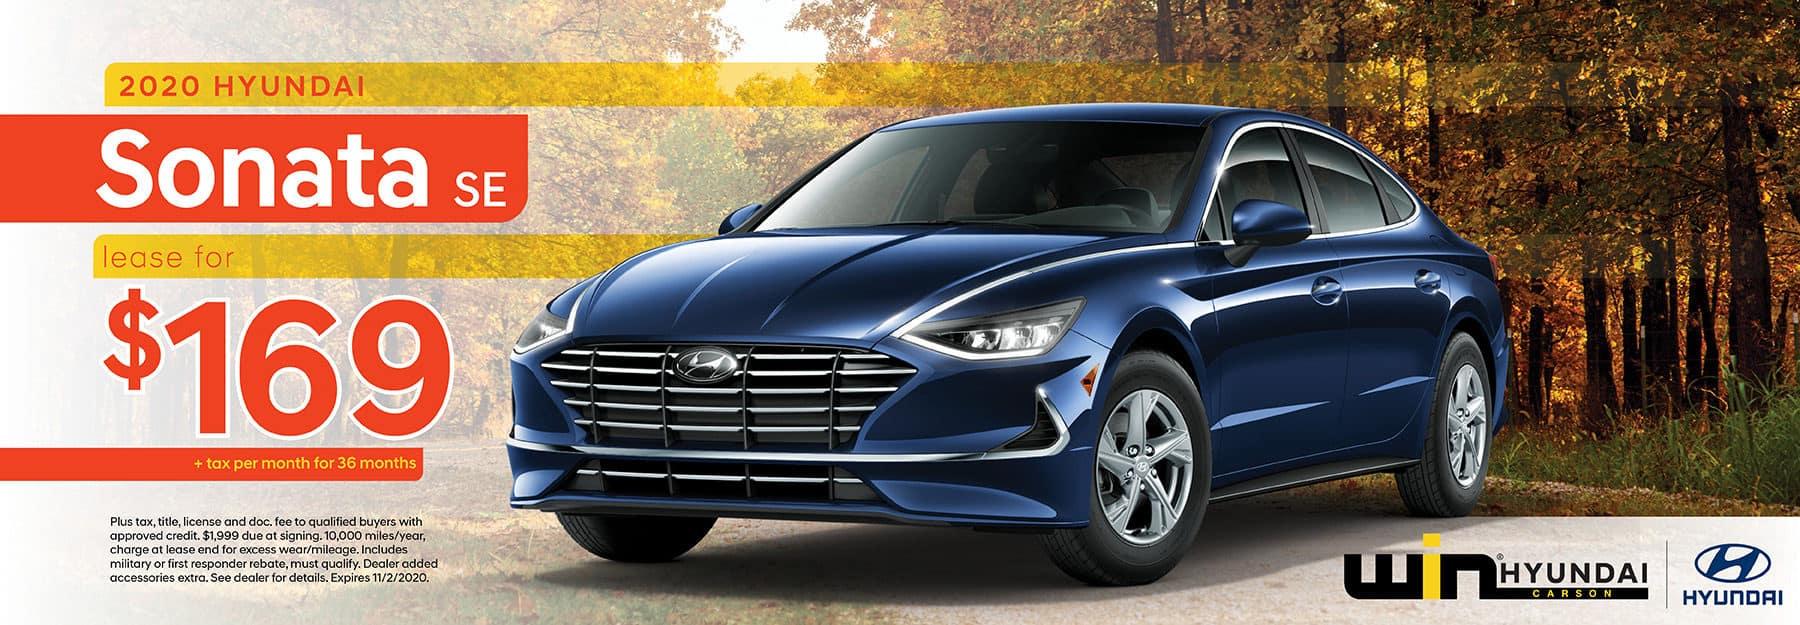 2020 Hyundai Sonata SE Lease for $169 | Carson, CA